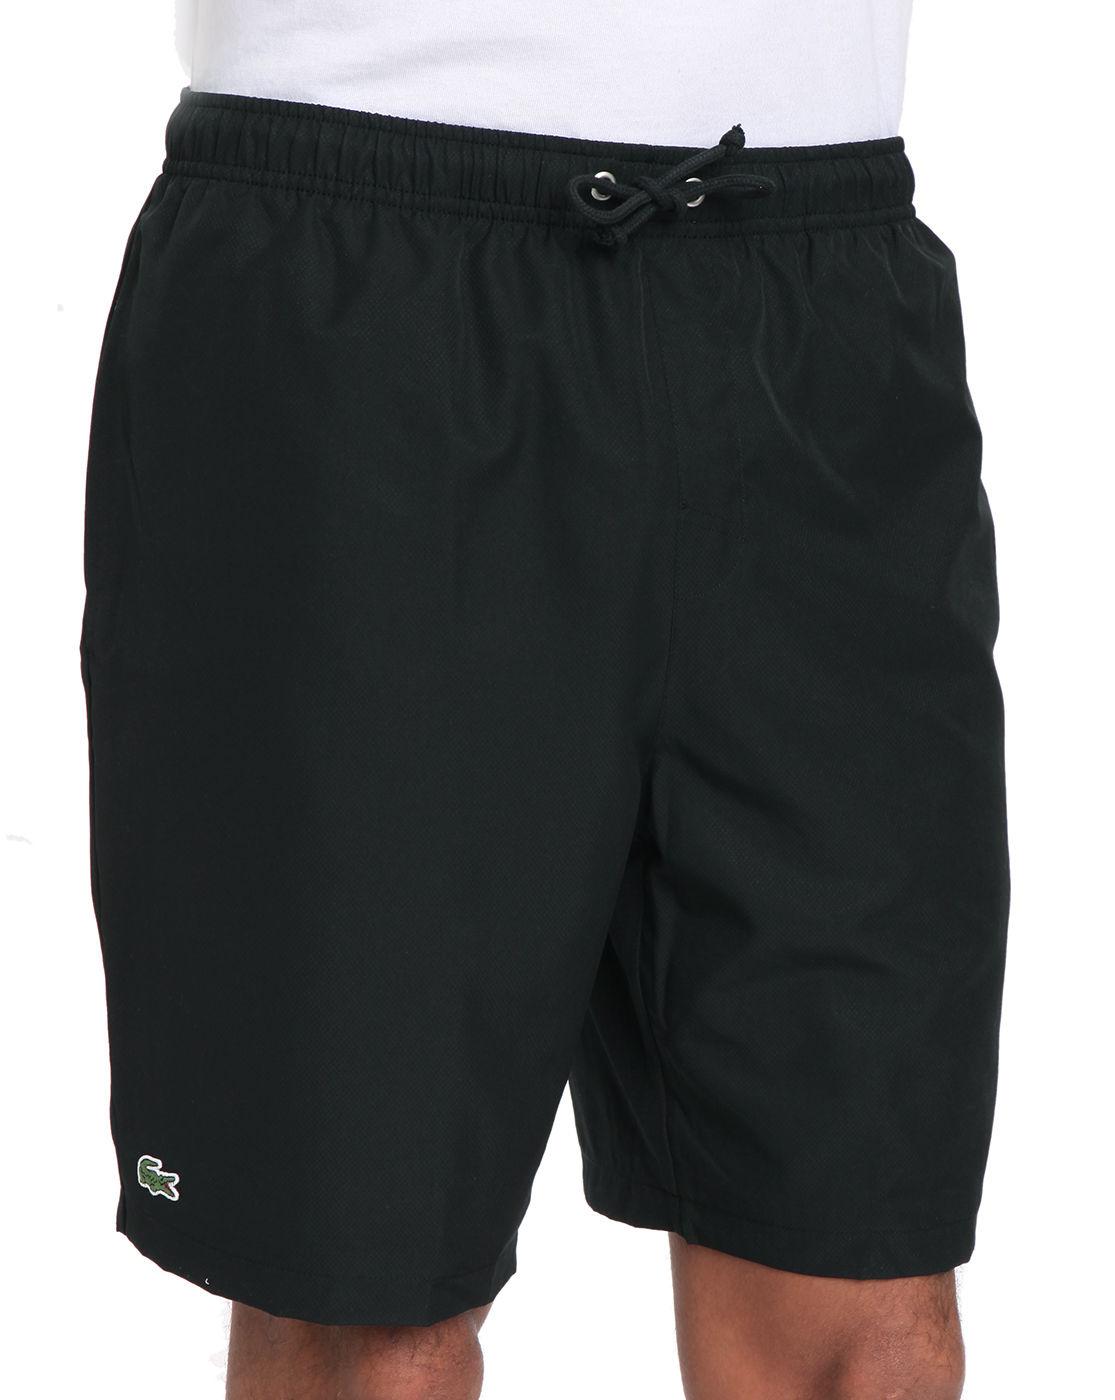 lacoste sport black polyester shorts in black for men lyst